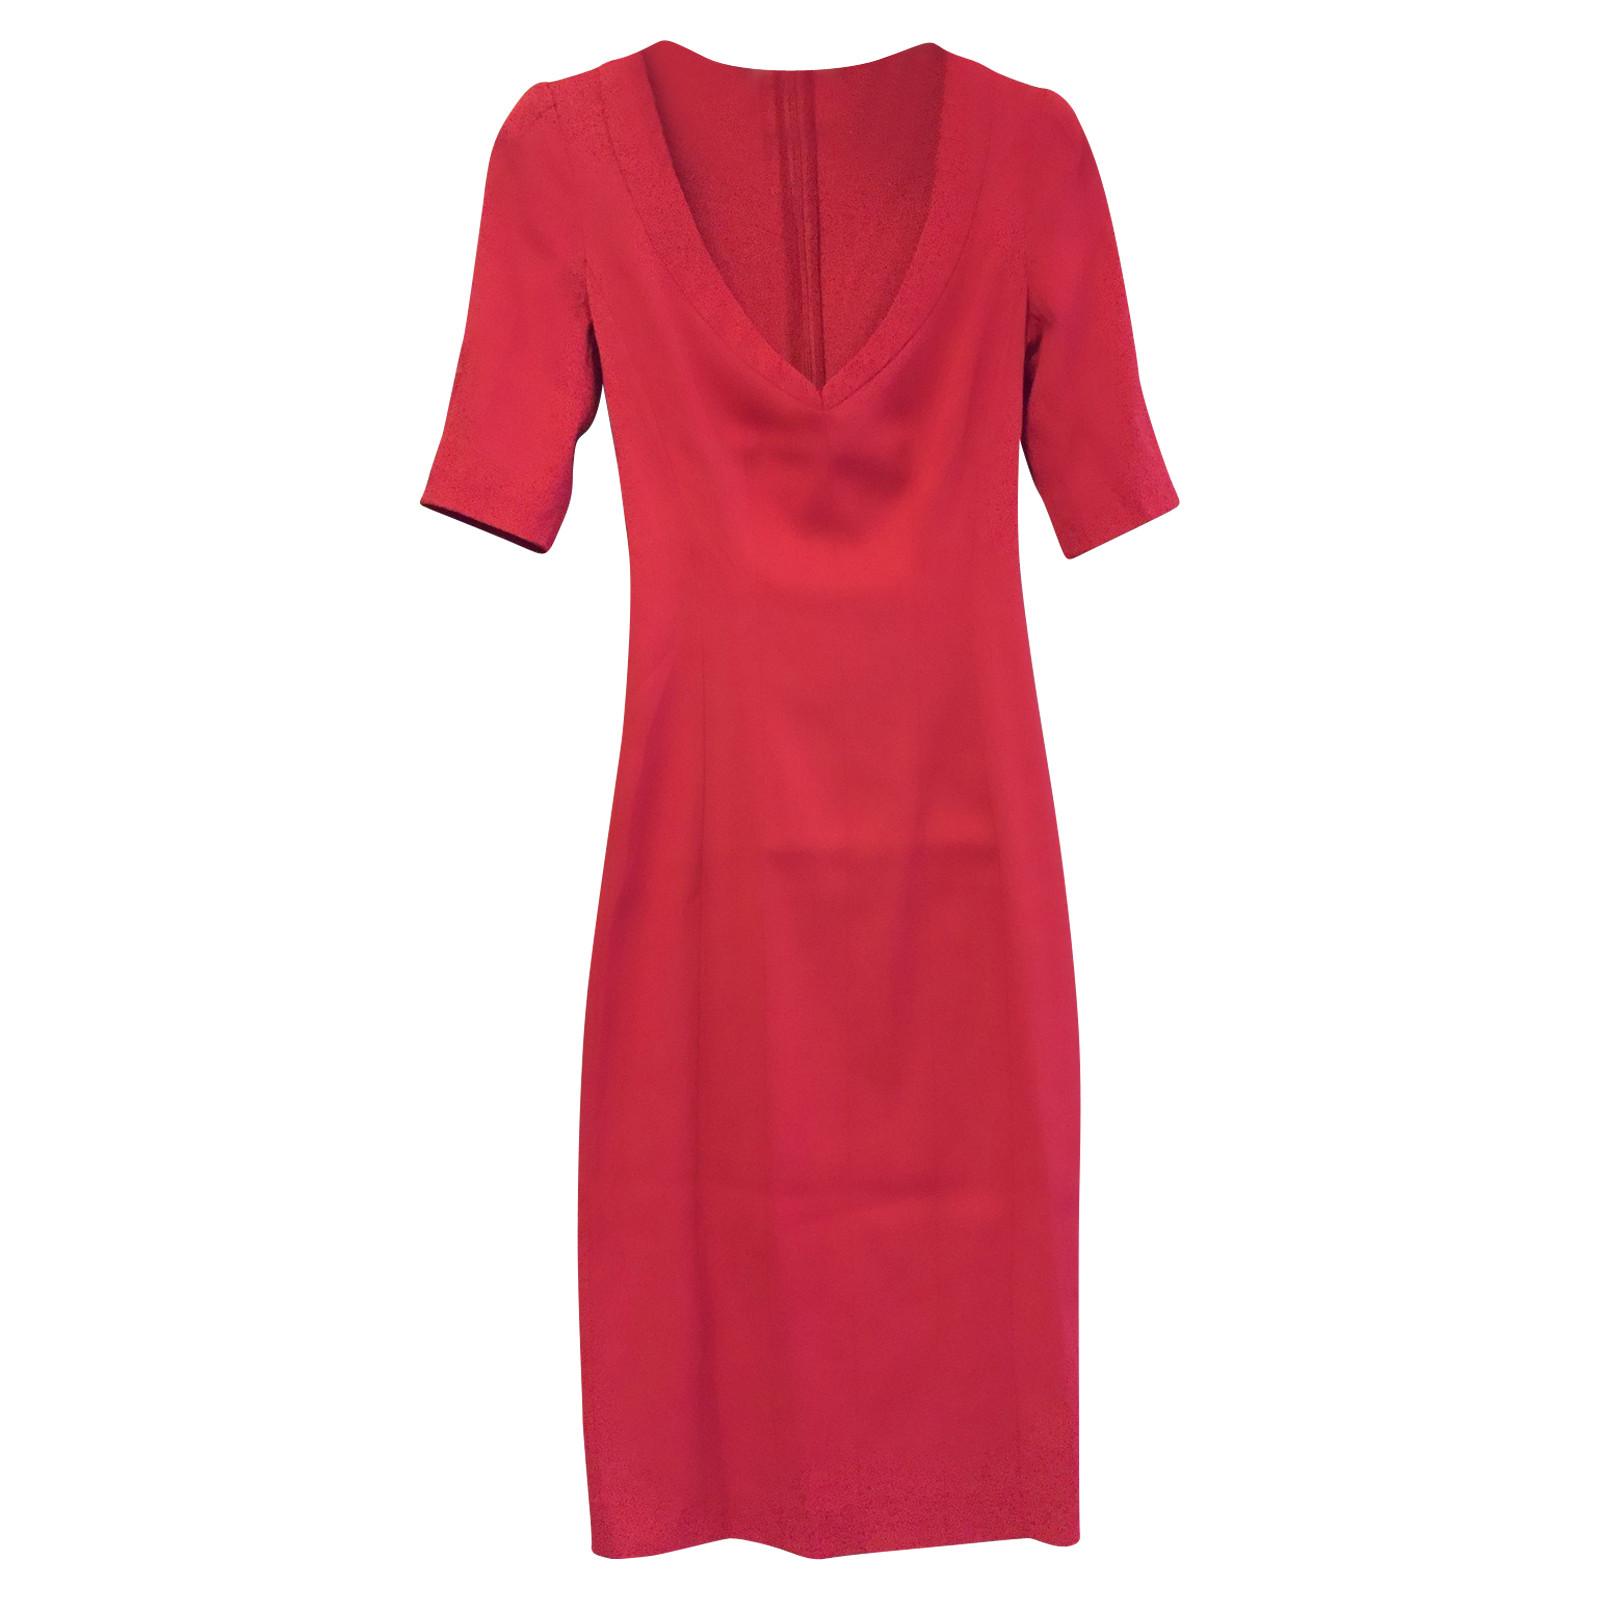 Armani Rotes Kleid - Second Hand Armani Rotes Kleid gebraucht